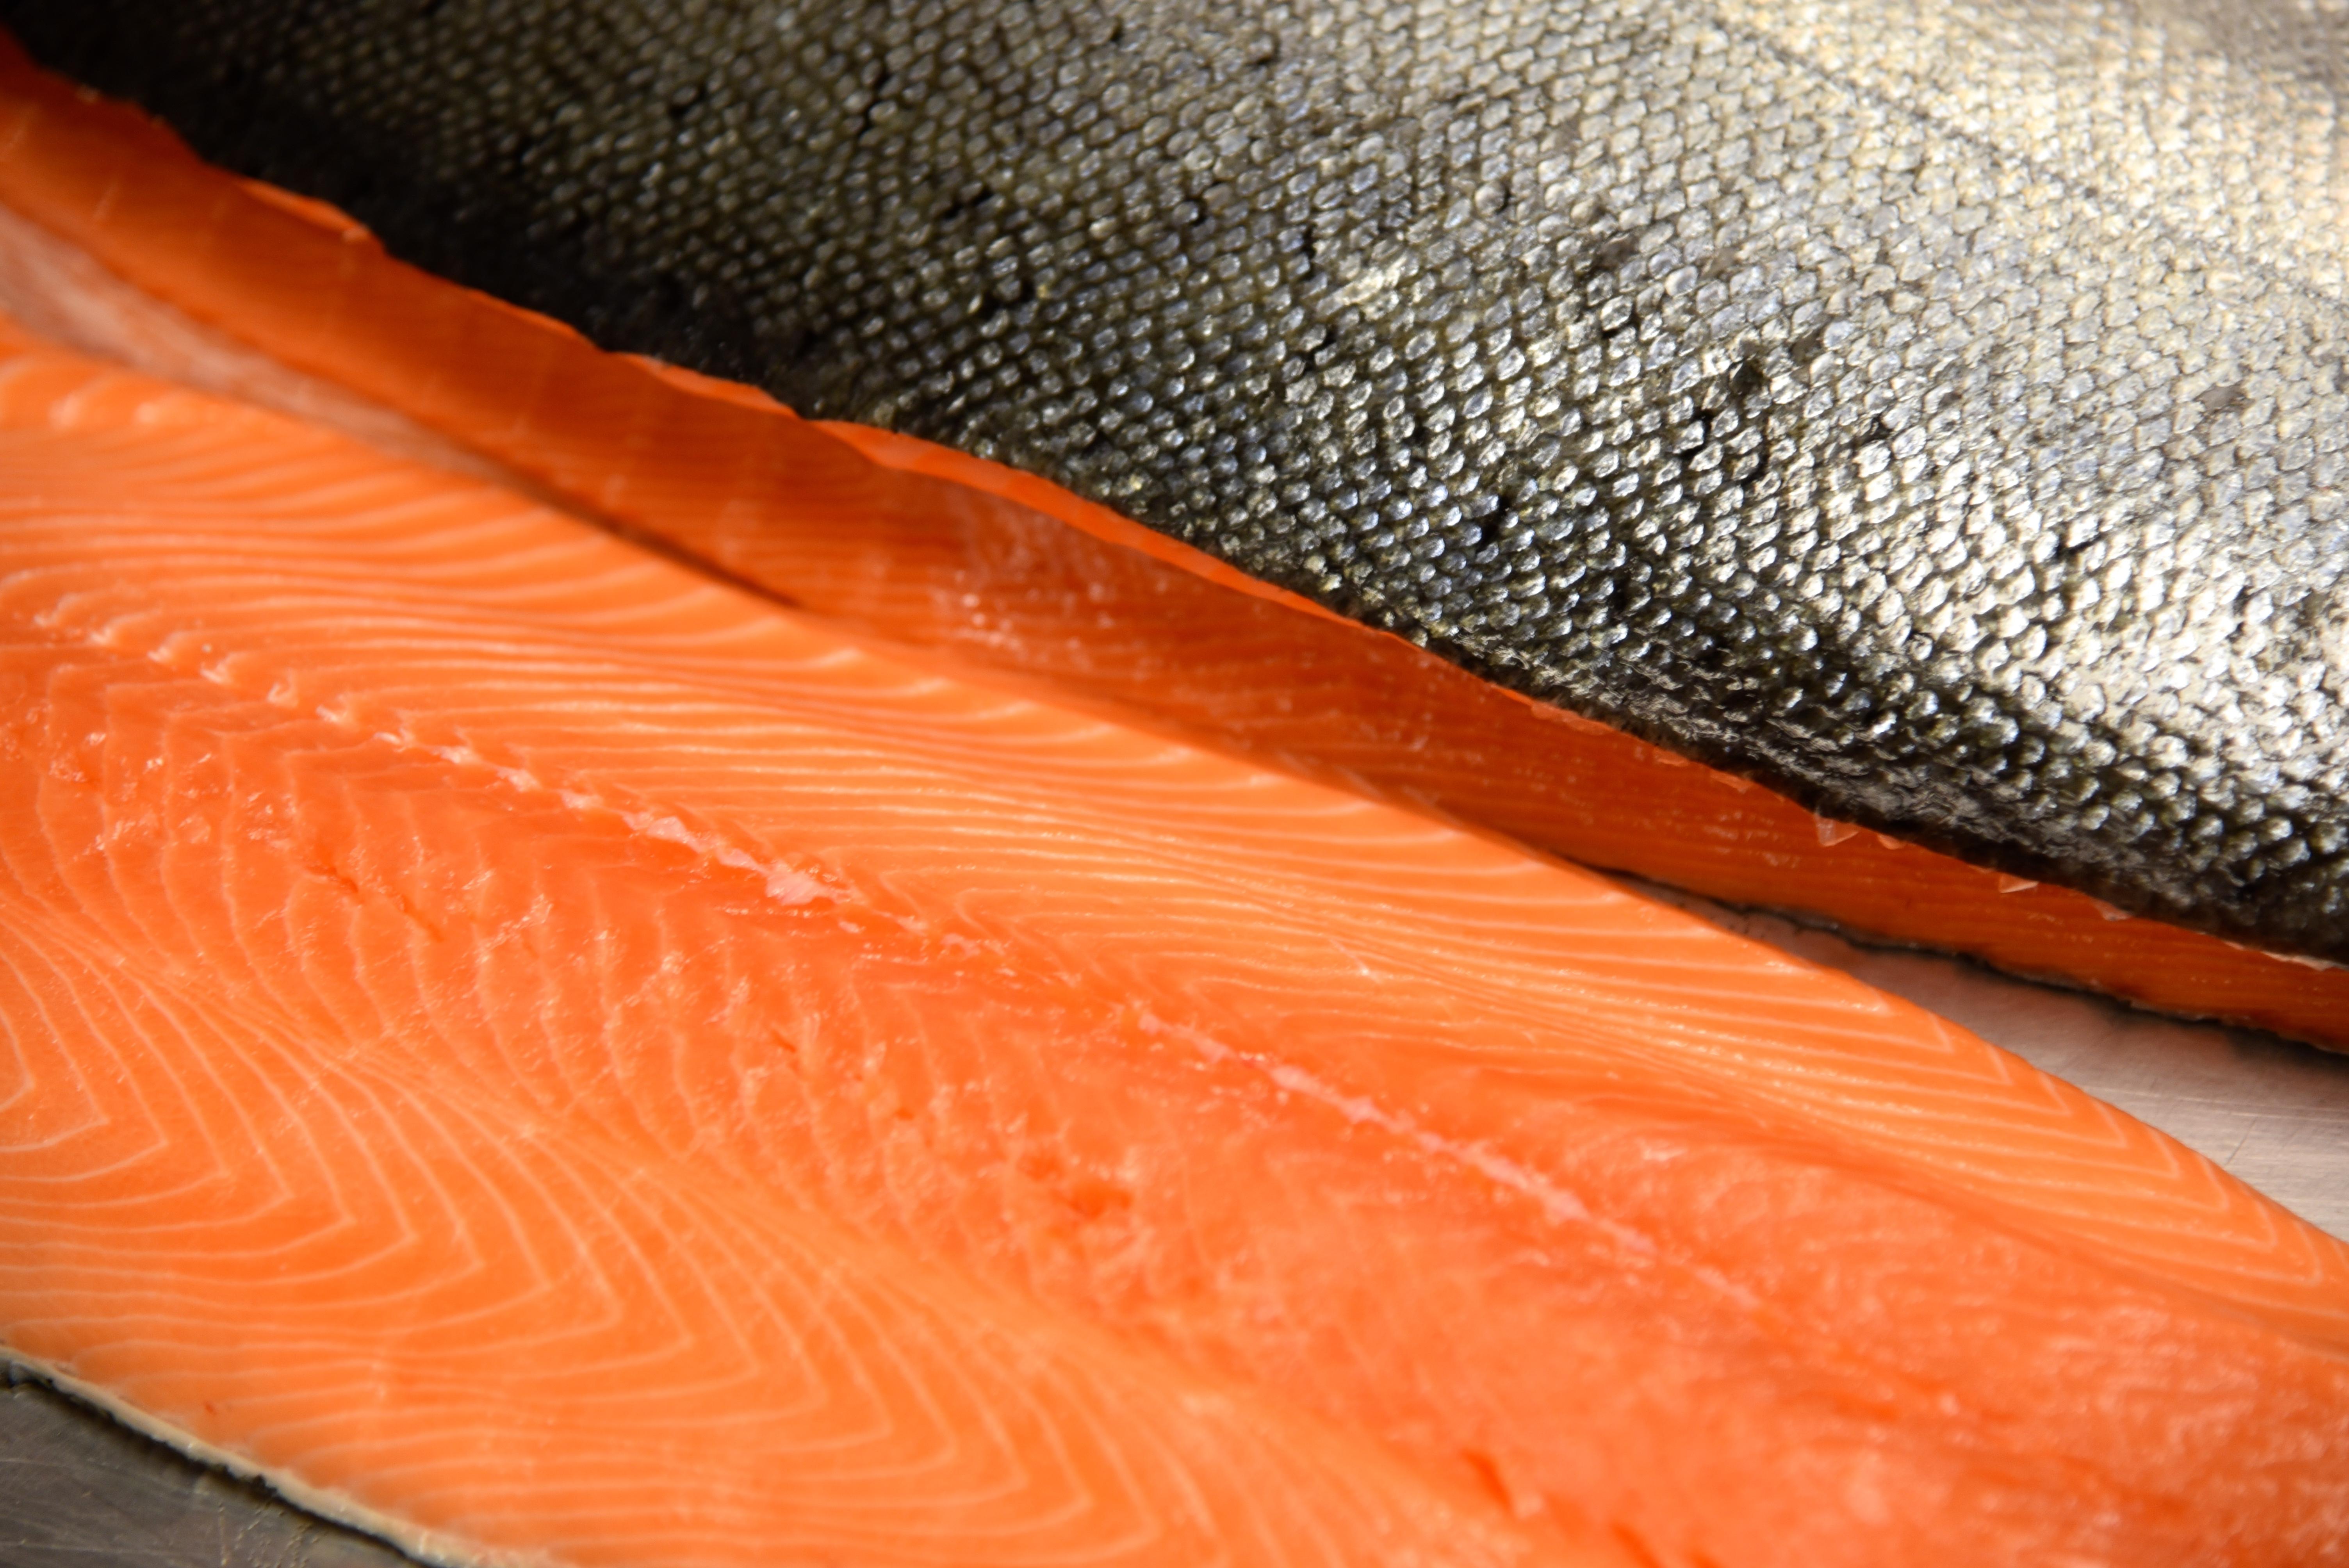 Seattle's ubiquitous salmon